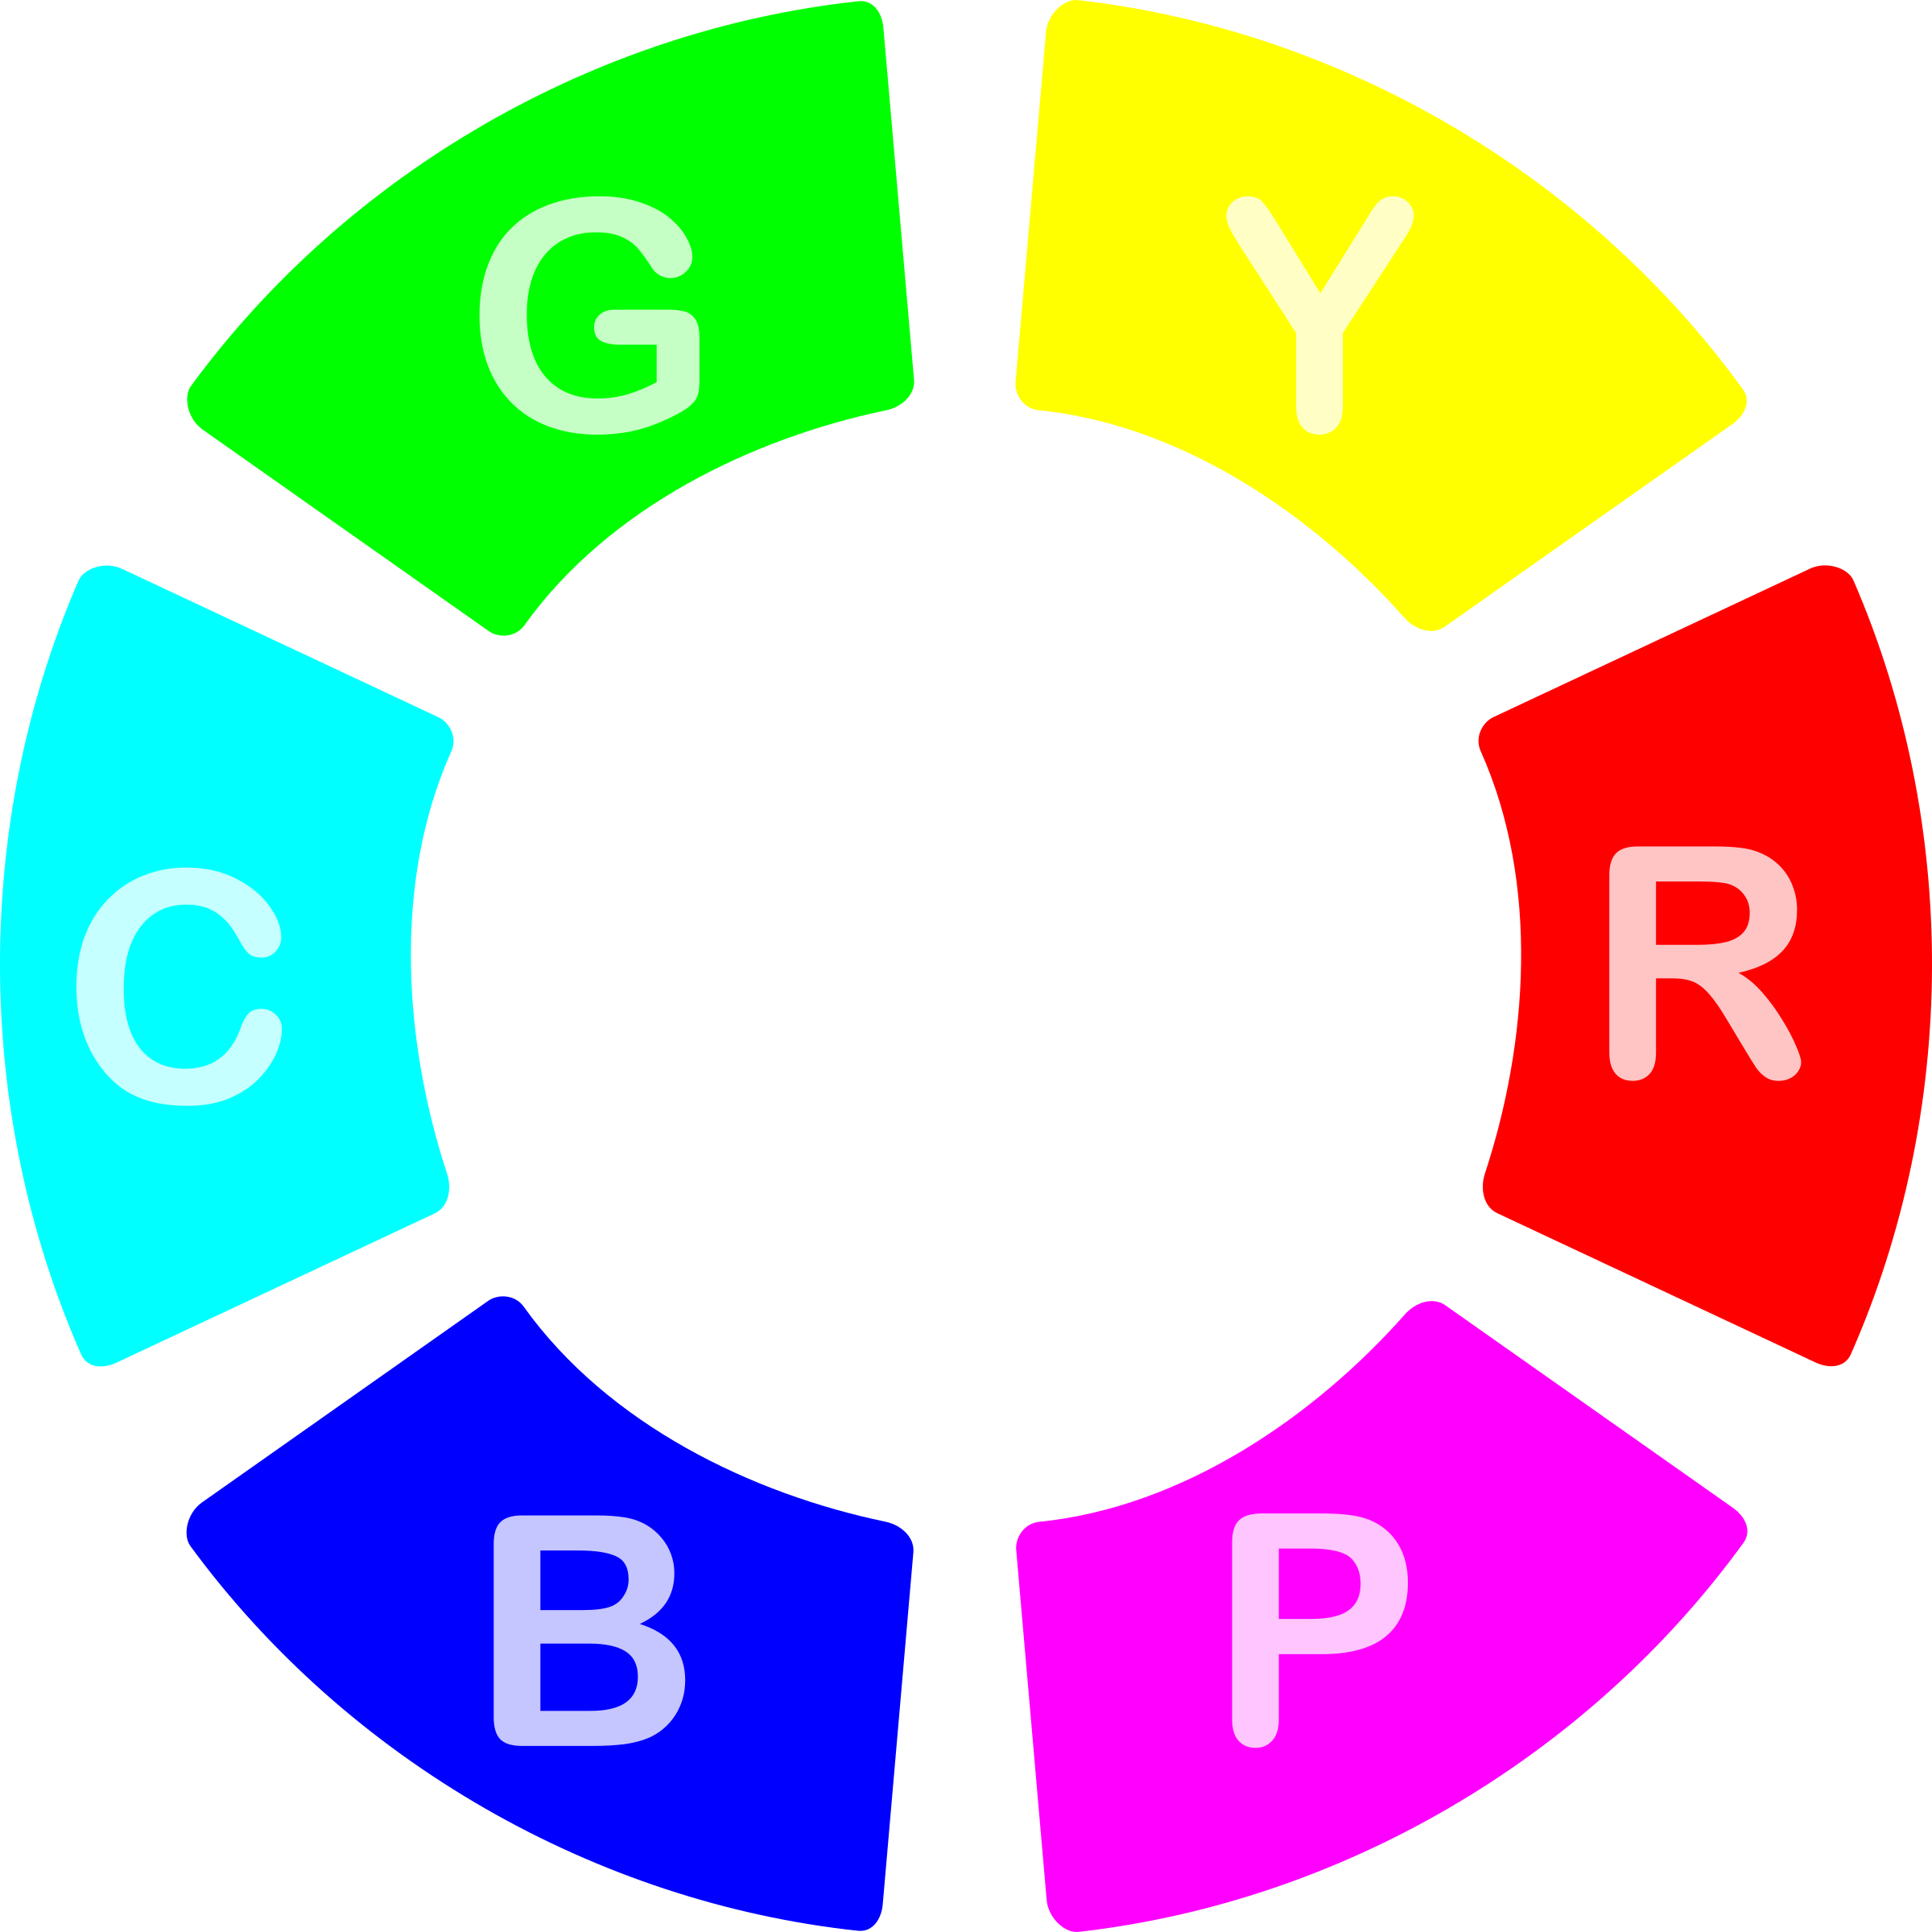 Big image png. Color clipart color wheel